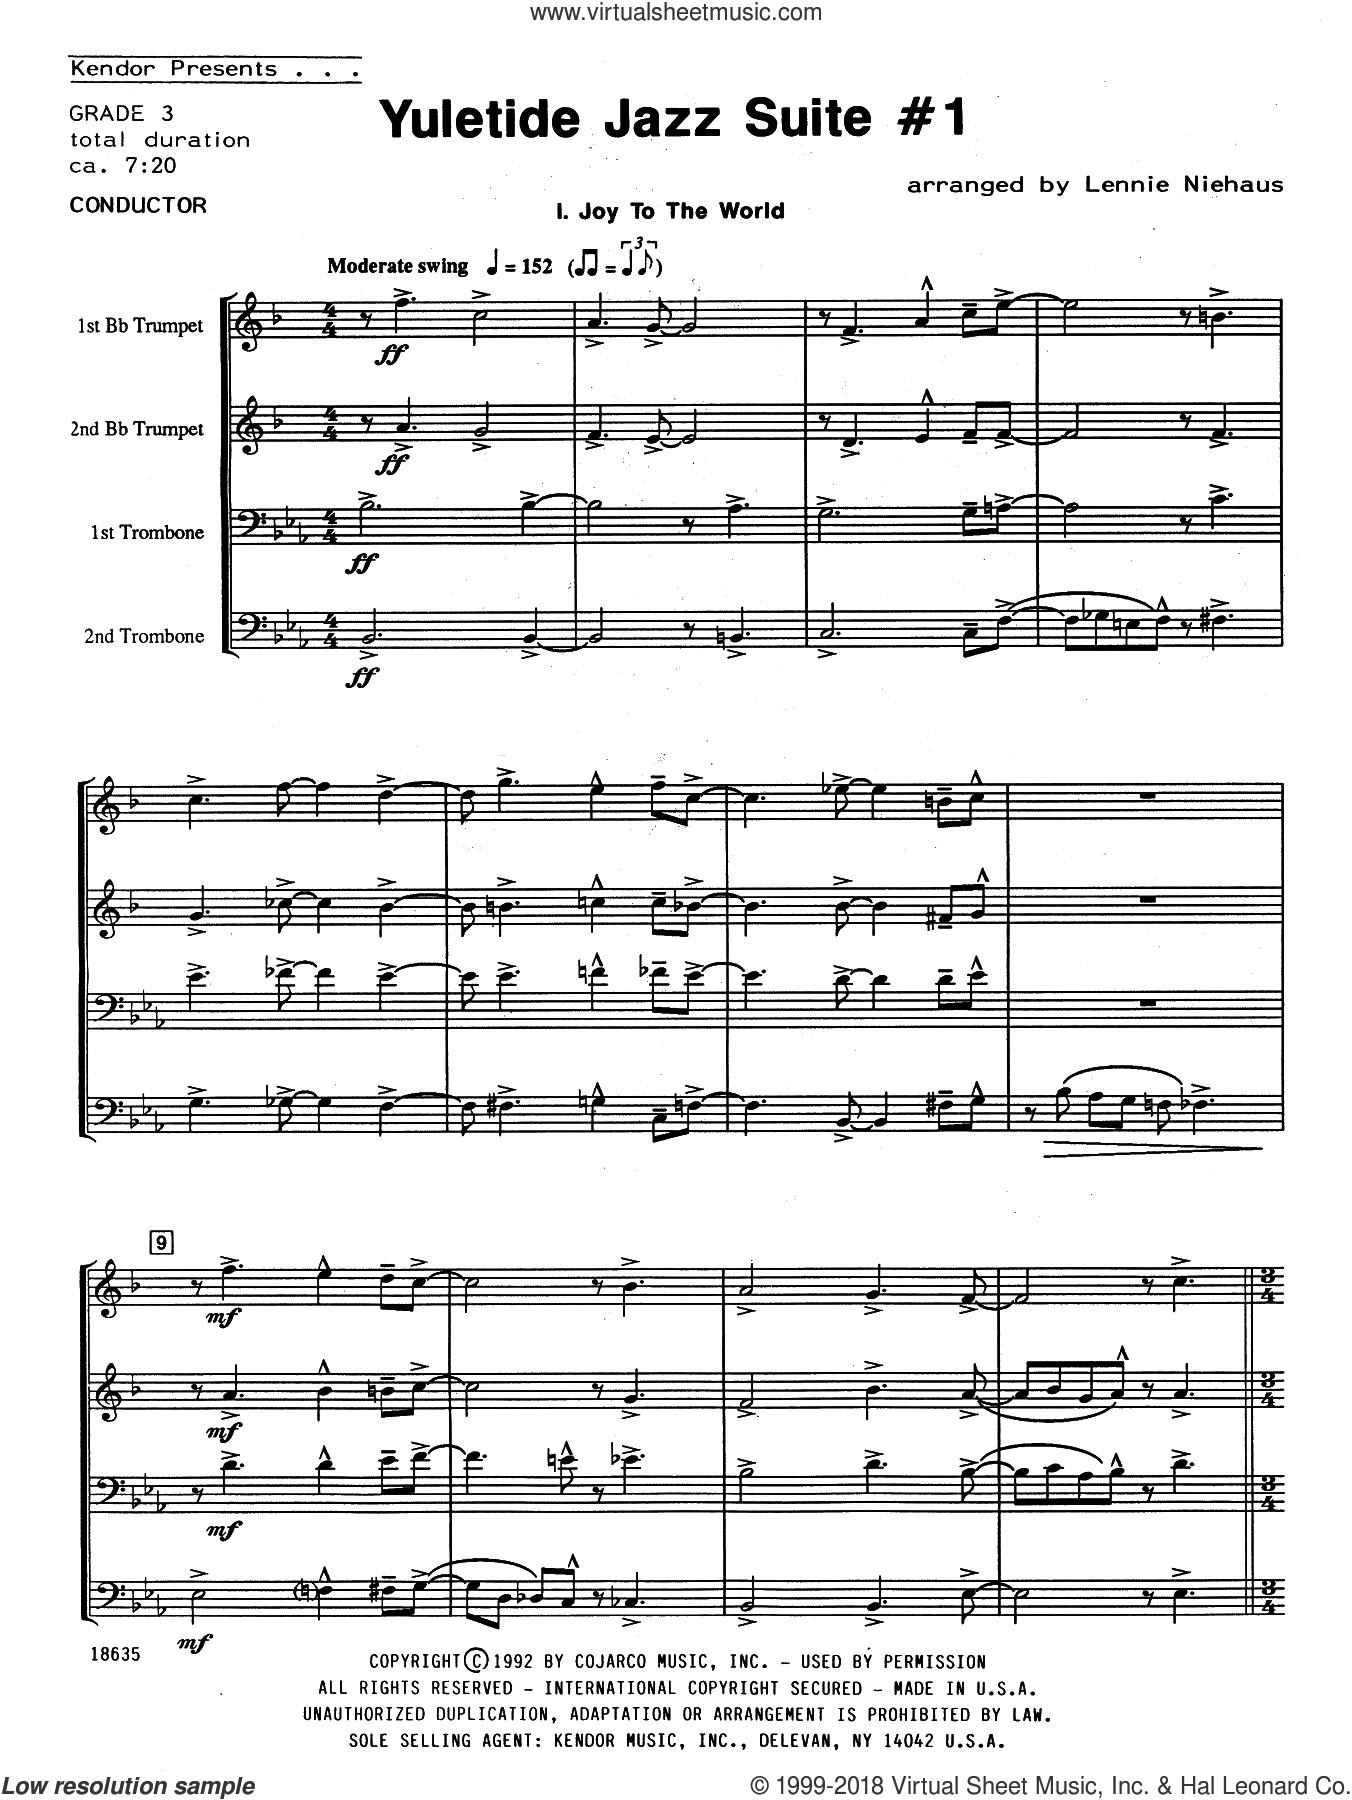 Yuletide Jazz Suite #1 (COMPLETE) sheet music for brass quartet by Lennie Niehaus, intermediate skill level